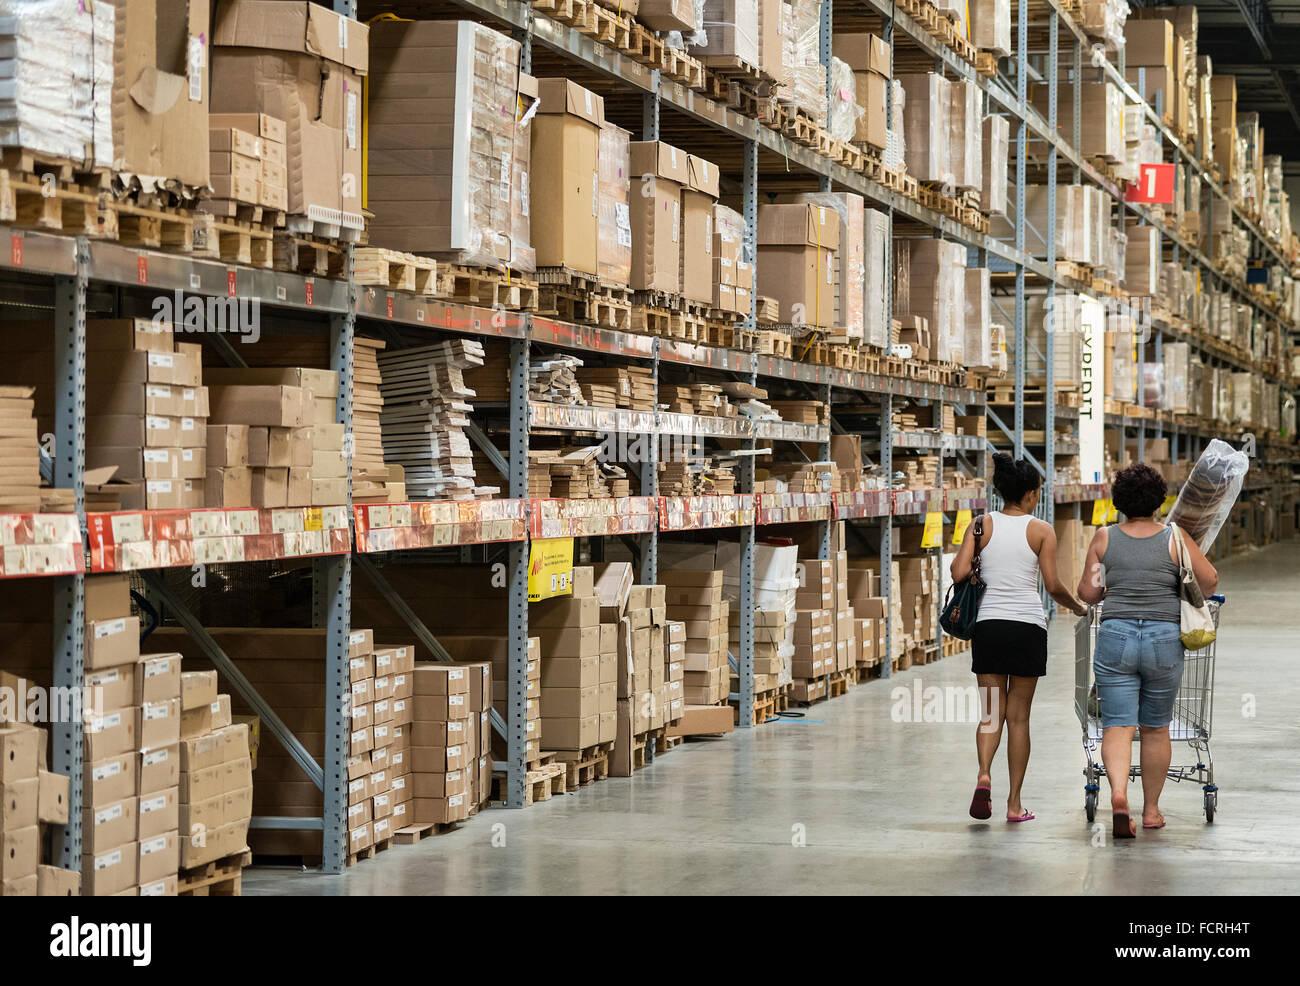 Warehouse storage of retail merchandise. - Stock Image